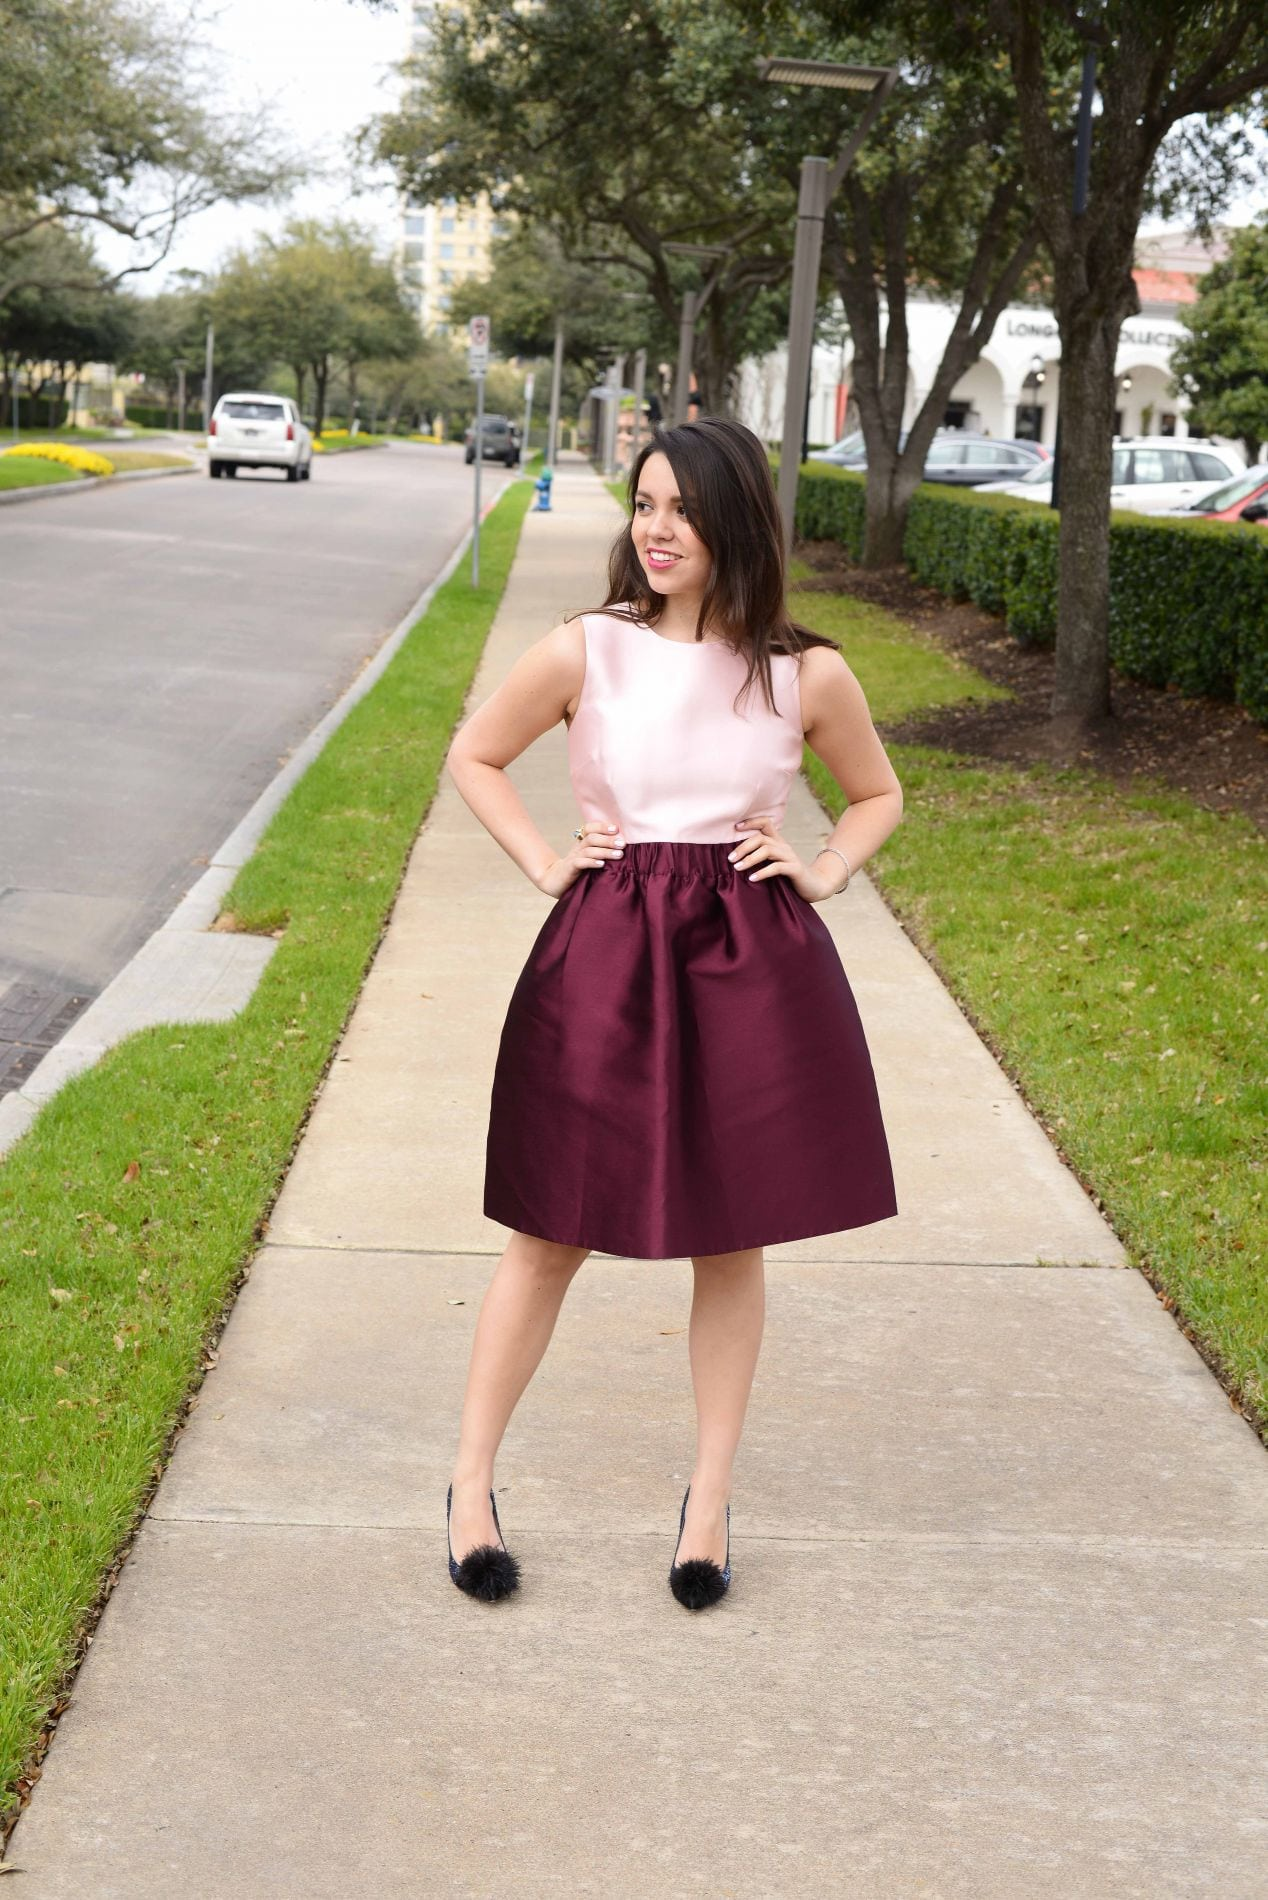 Kate Spade Swift Dress - Easter, Spring Wedding Dress idea